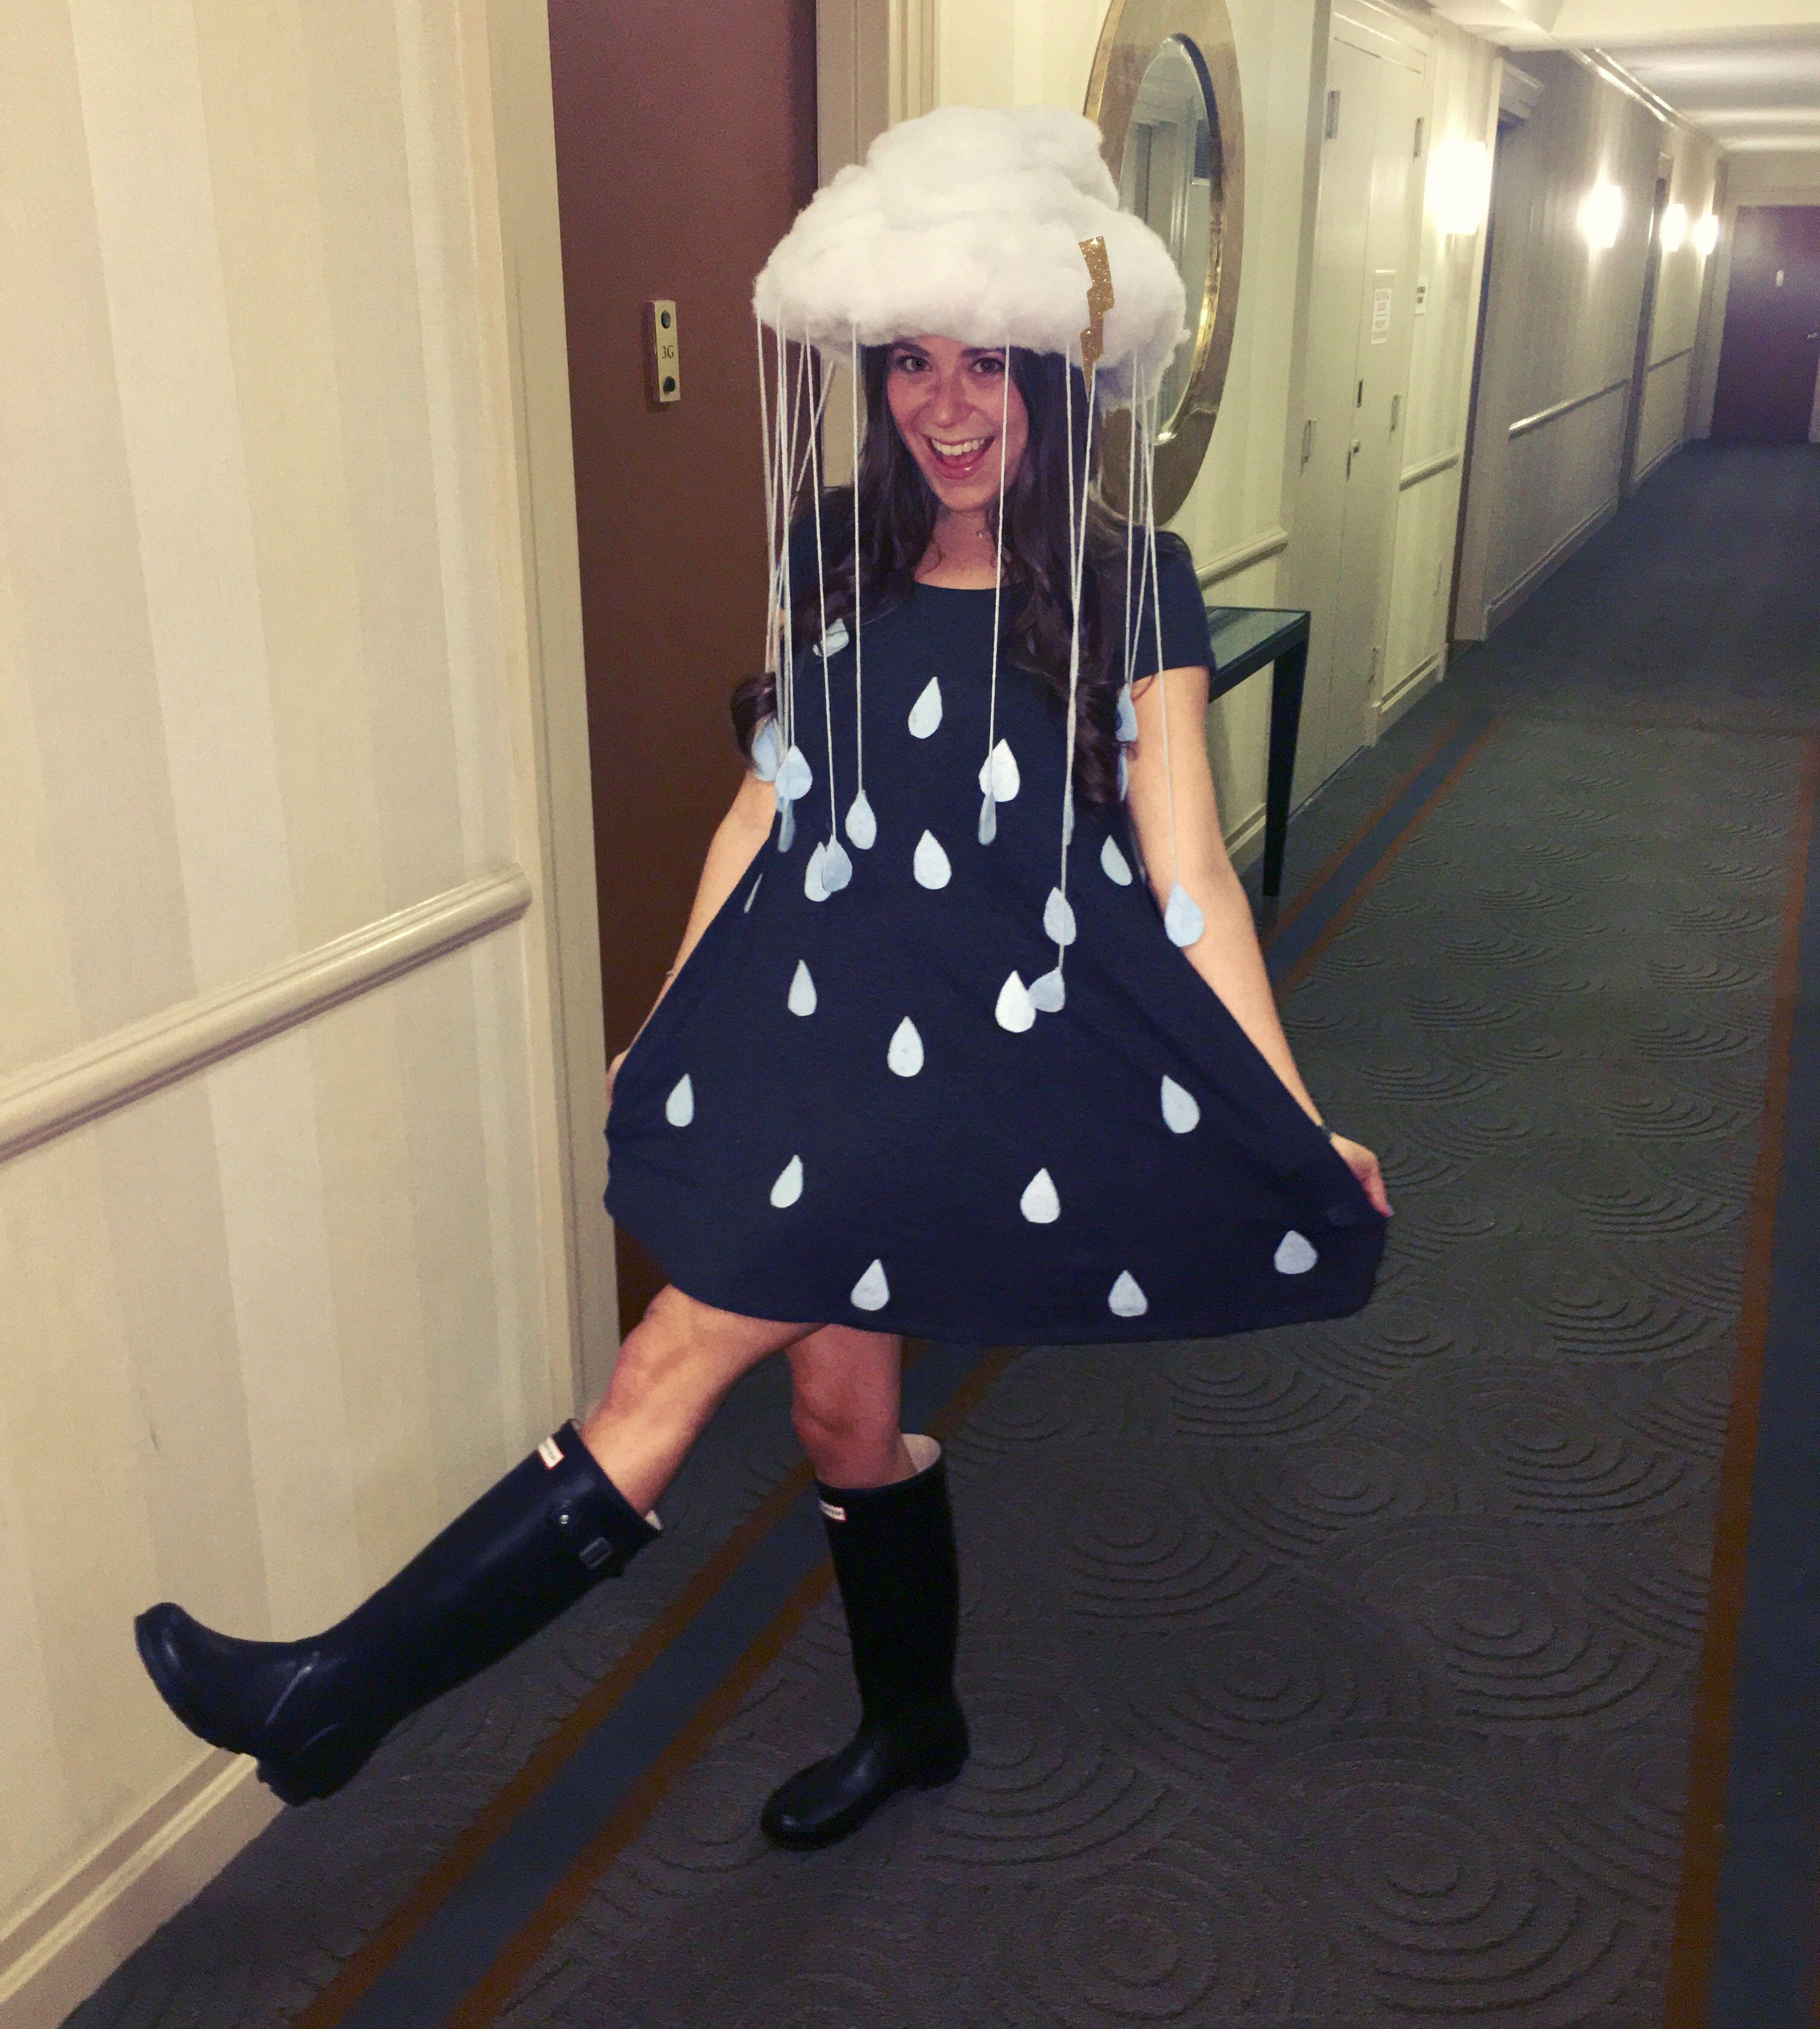 Diy Rain Costume Karneval Halloween Costumes Costumes Und